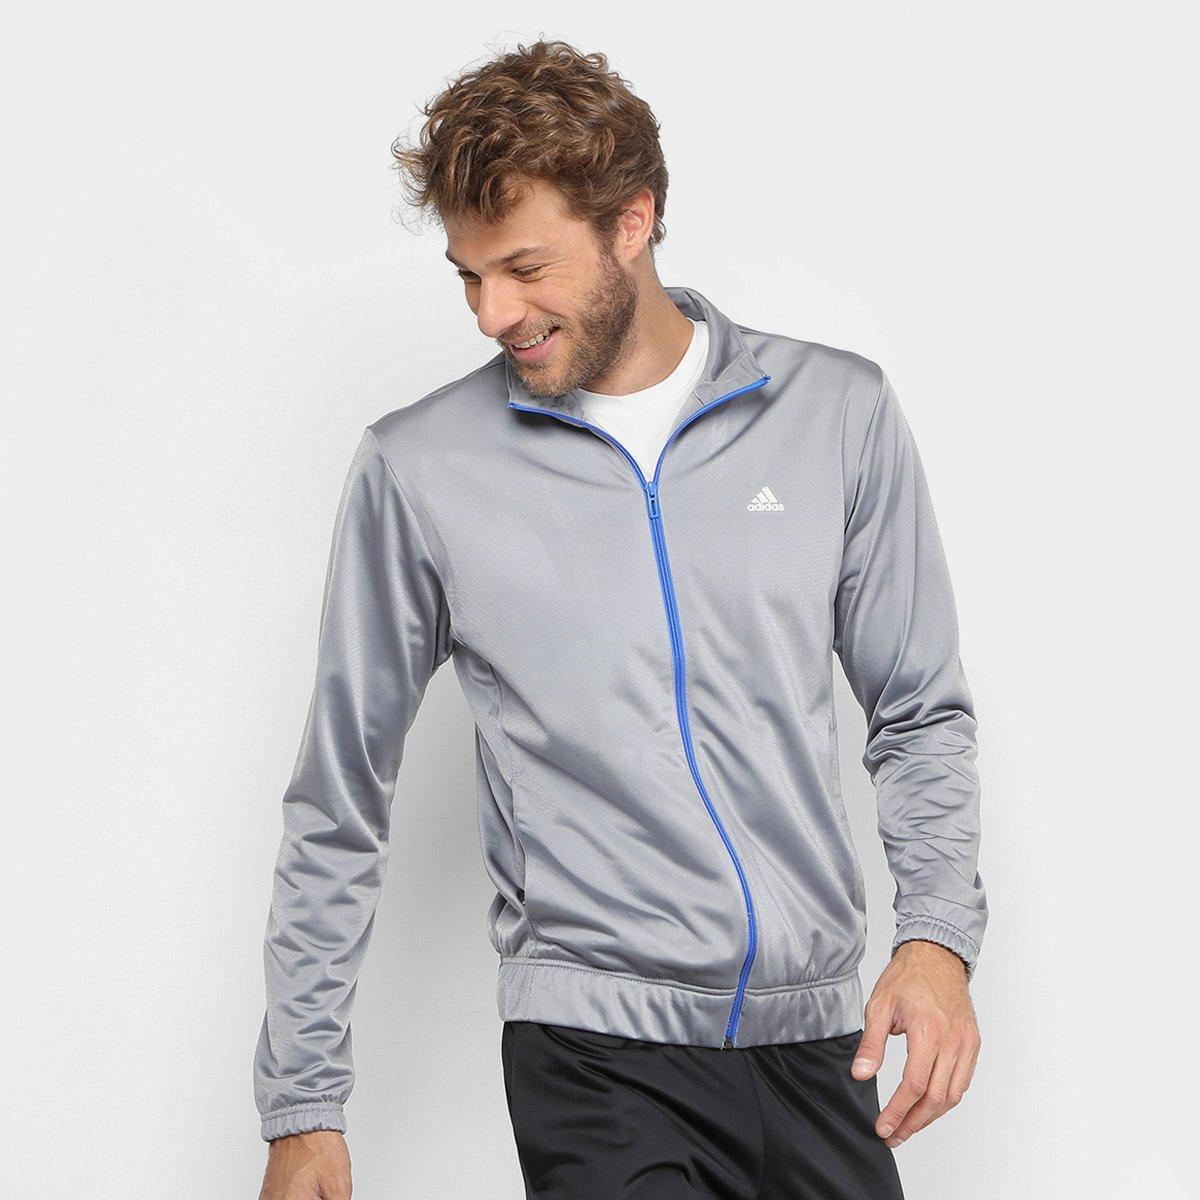 57f0803332 Agasalho Adidas Ep Masculino - Cinza e Preto - Compre Agora